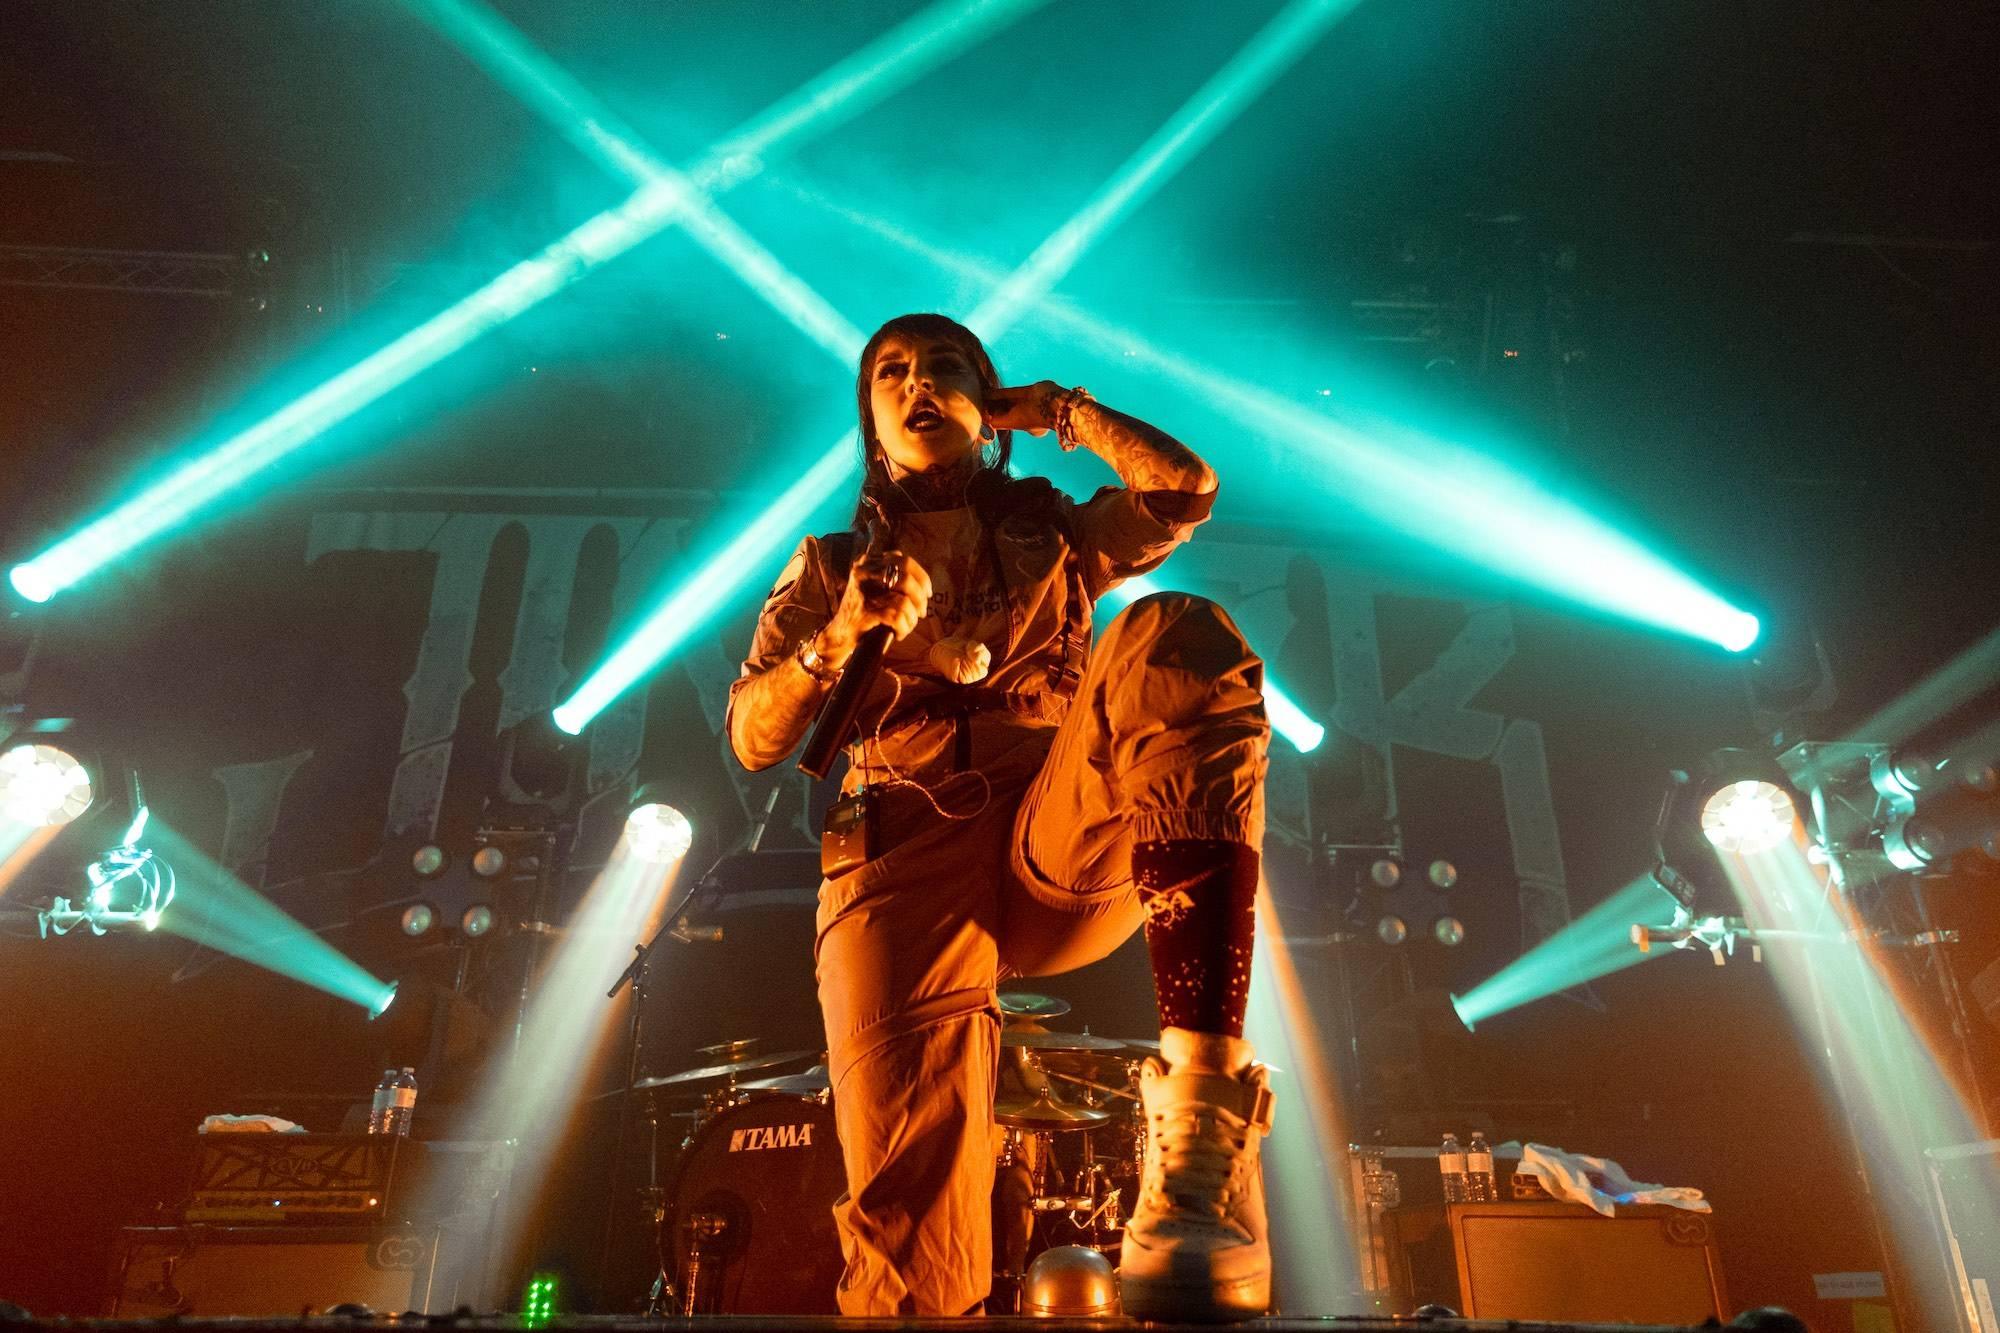 Jinjer at the Rickshaw Theatre, Vancouver, Oct 31 2019. Scott Alexander photo.